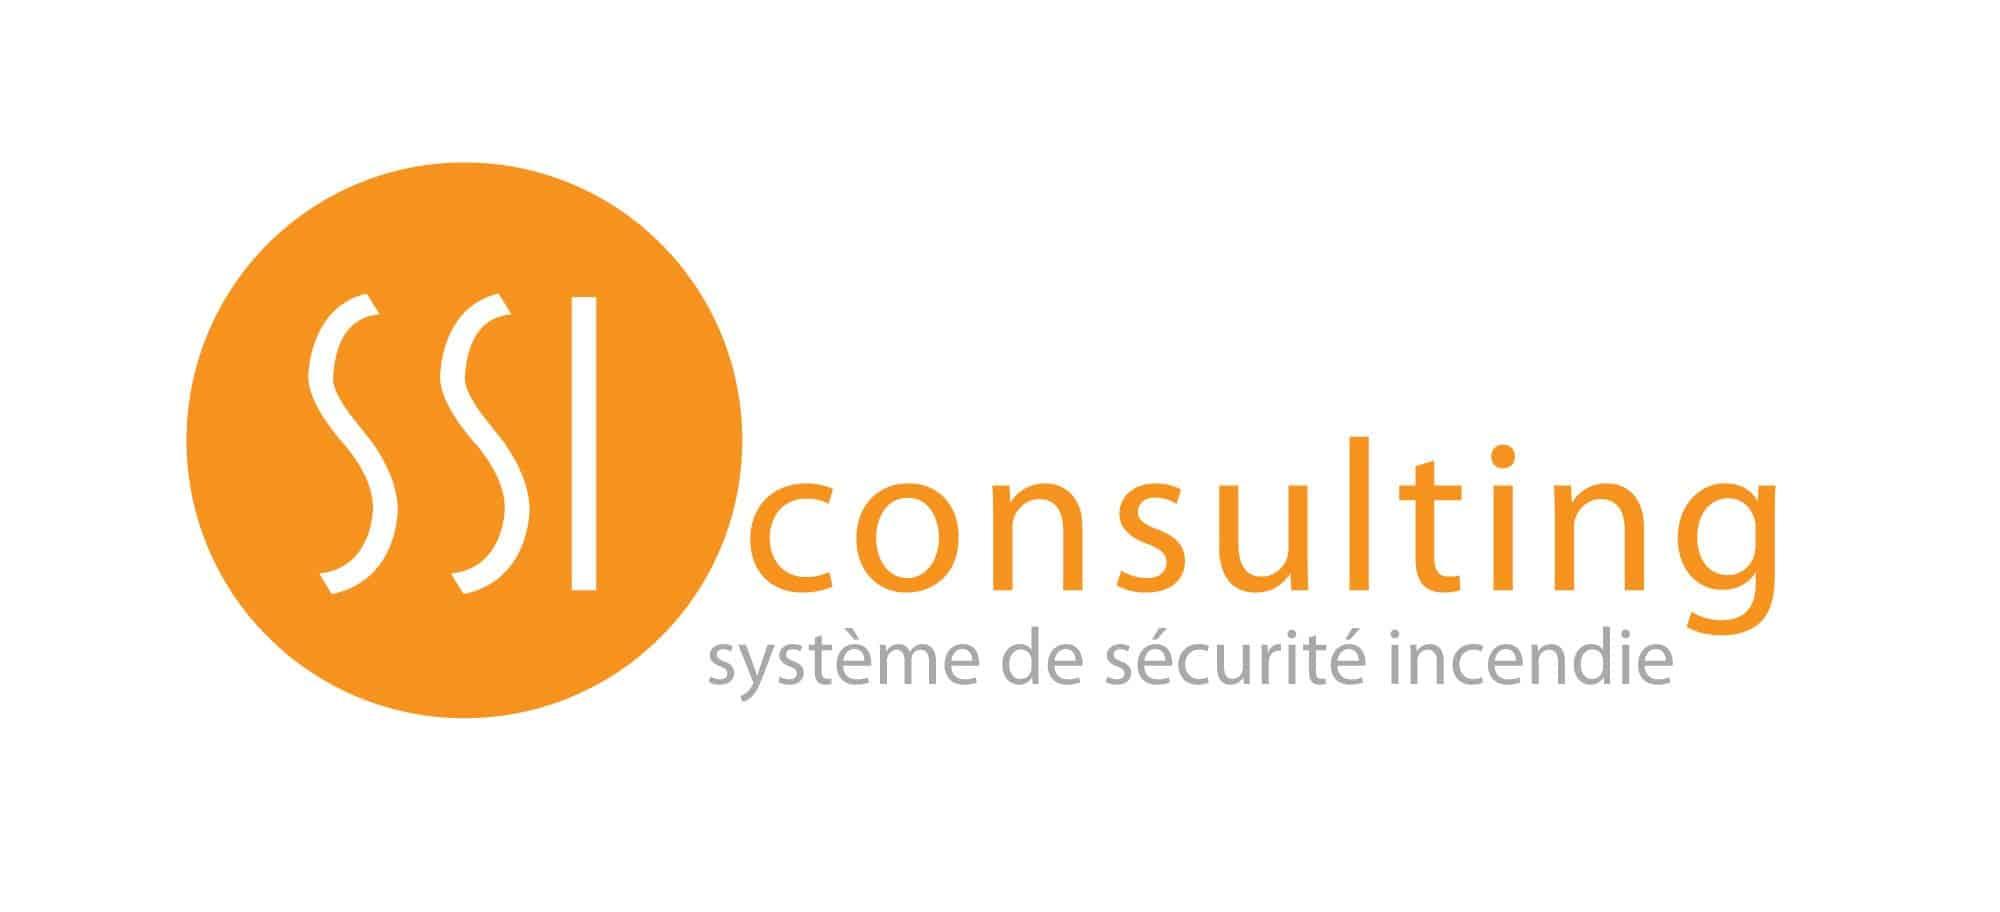 ssi-consulting-incendie